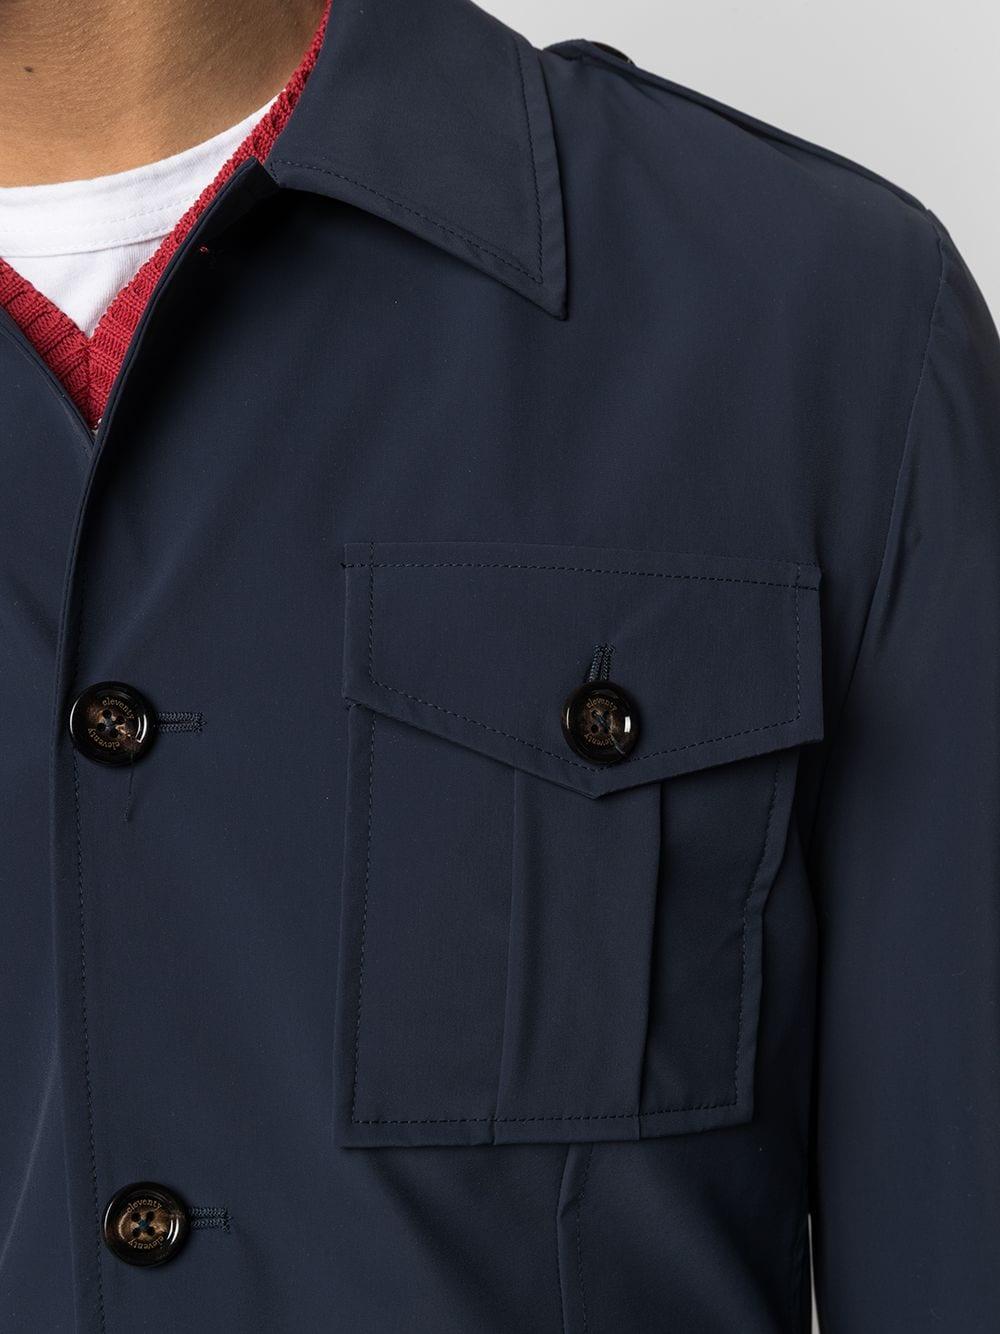 Giacca blu navy con multi tasche frontali ELEVENTY | Giacche | C75GIAC01-TES0C19511